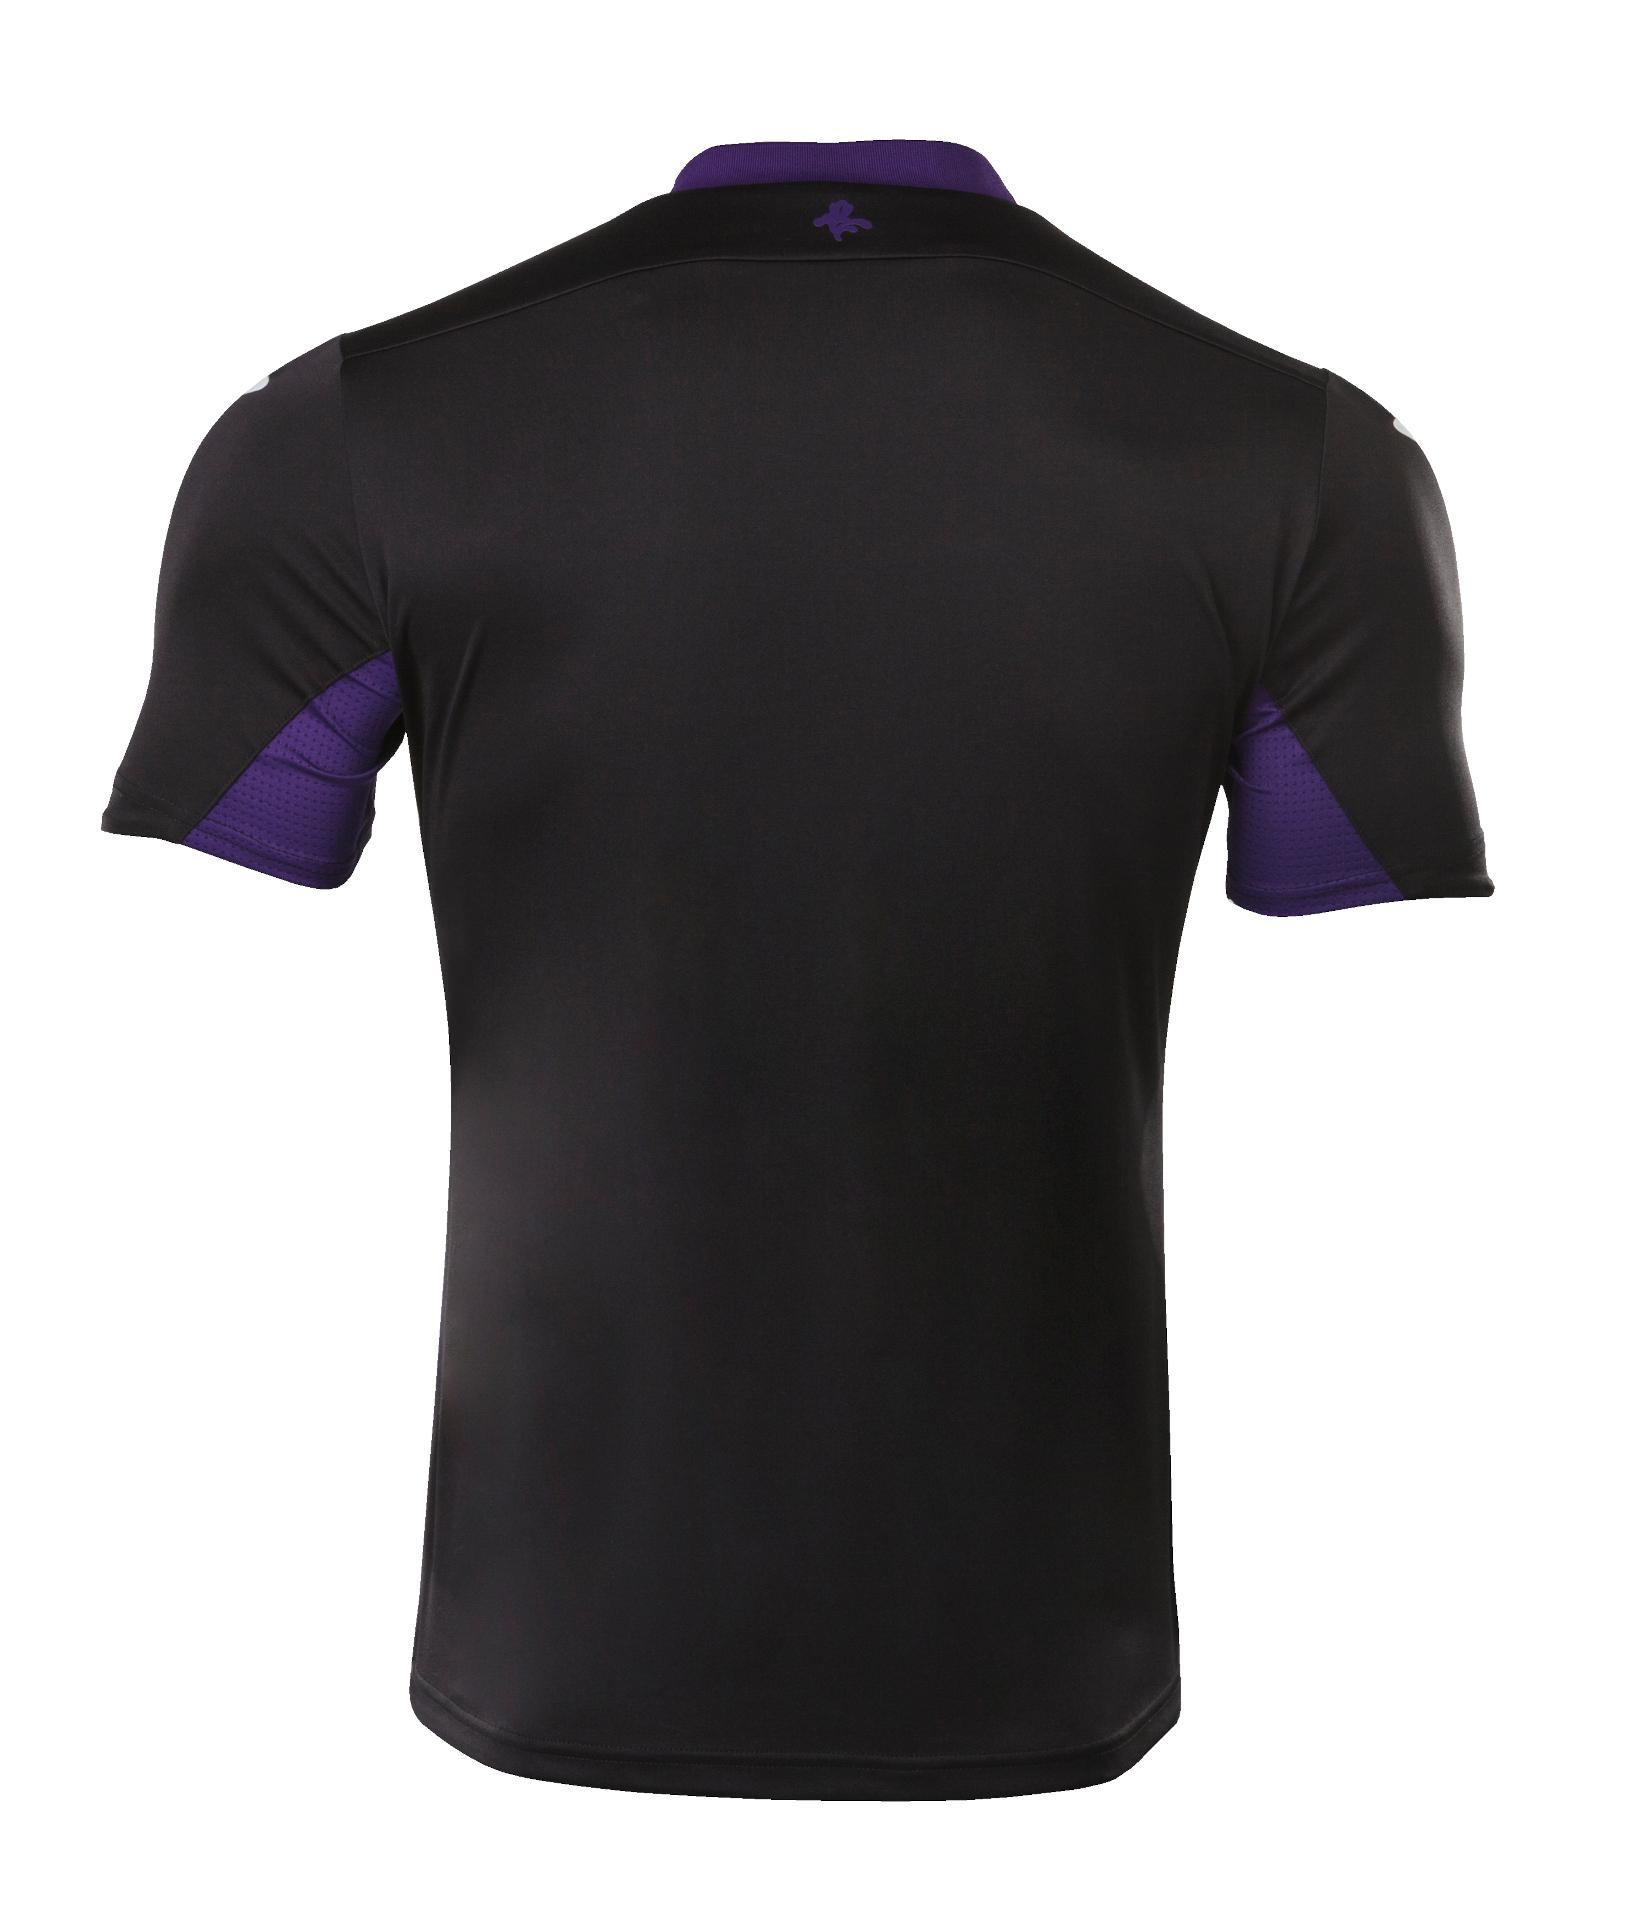 RSCA Derde Shirt 2020/2021 - Candriam